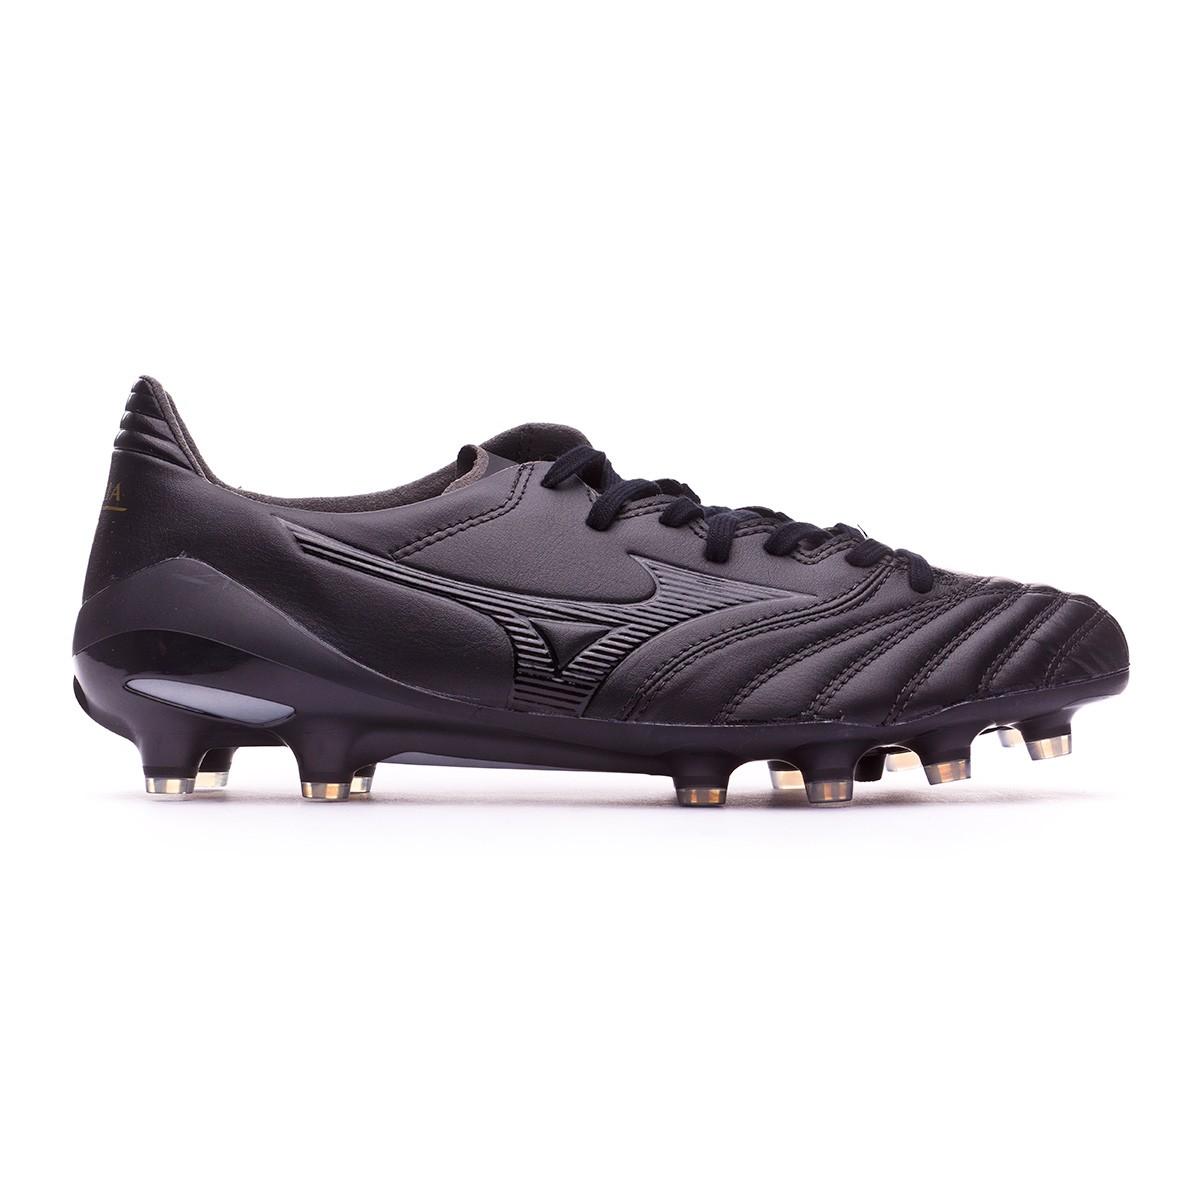 1258b51b267b2 Football Boots Mizuno Morelia NEO II MD Black - Tienda de fútbol Fútbol  Emotion